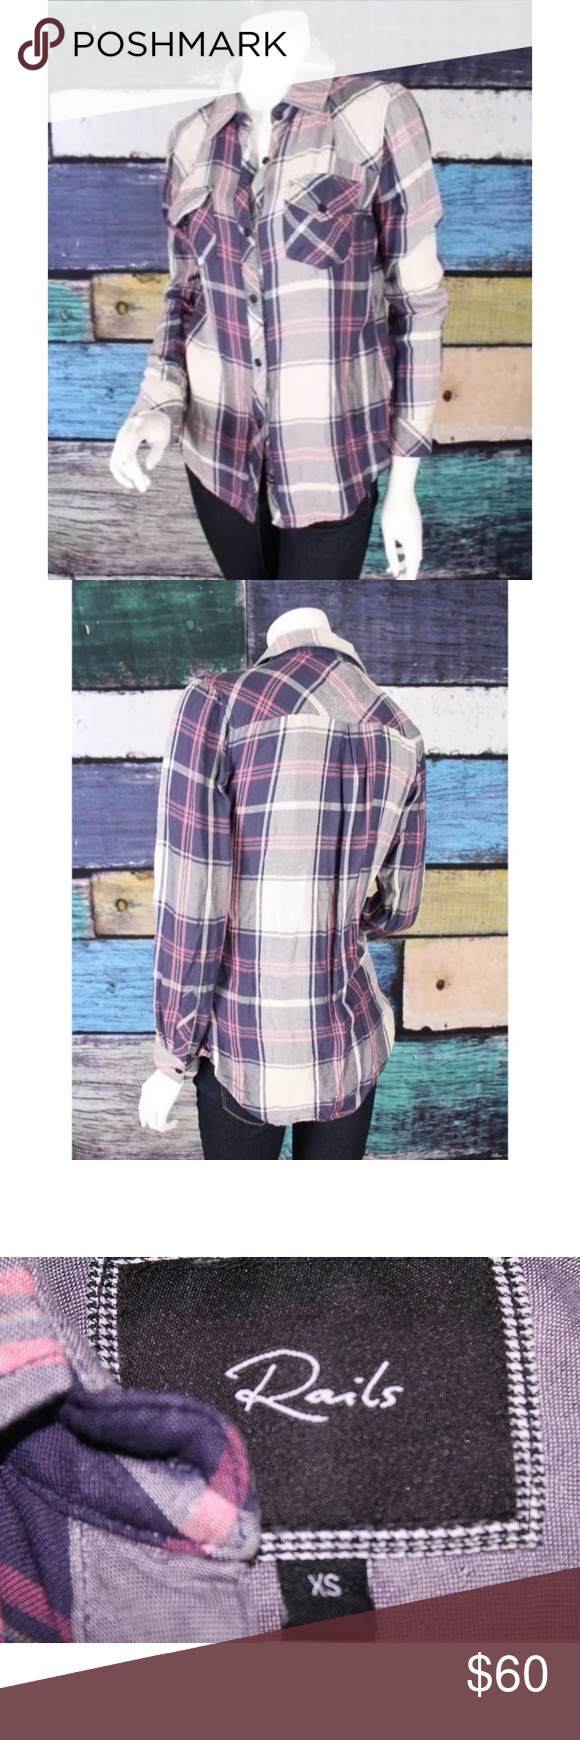 Pink dress shirt blue suit  Rails Blue Pink Hunter Plaid Check Shirt XS  Checked shirts Colour